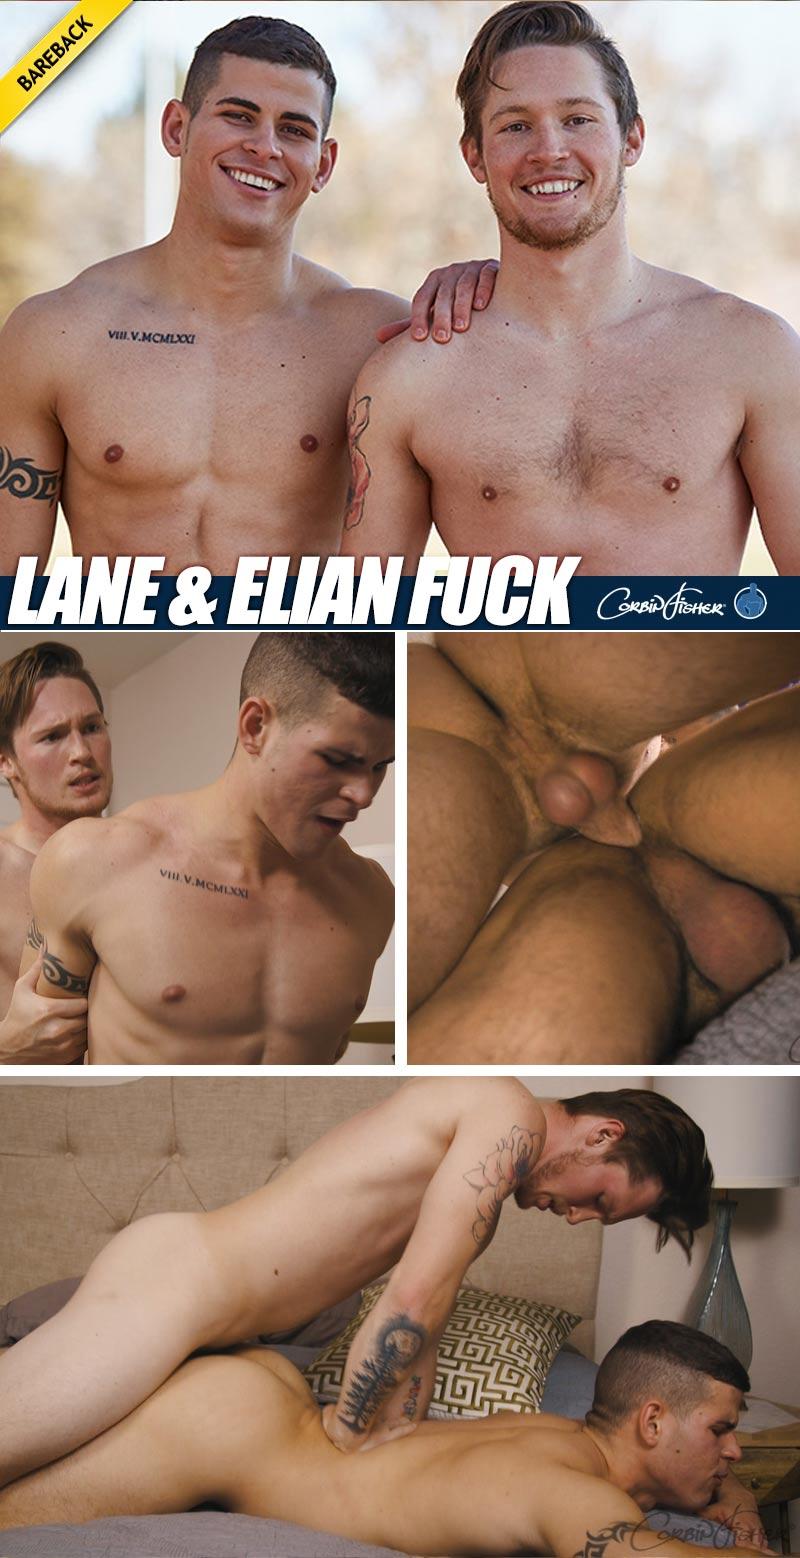 Lane Fucks Elian (Bareback) at CorbinFisher